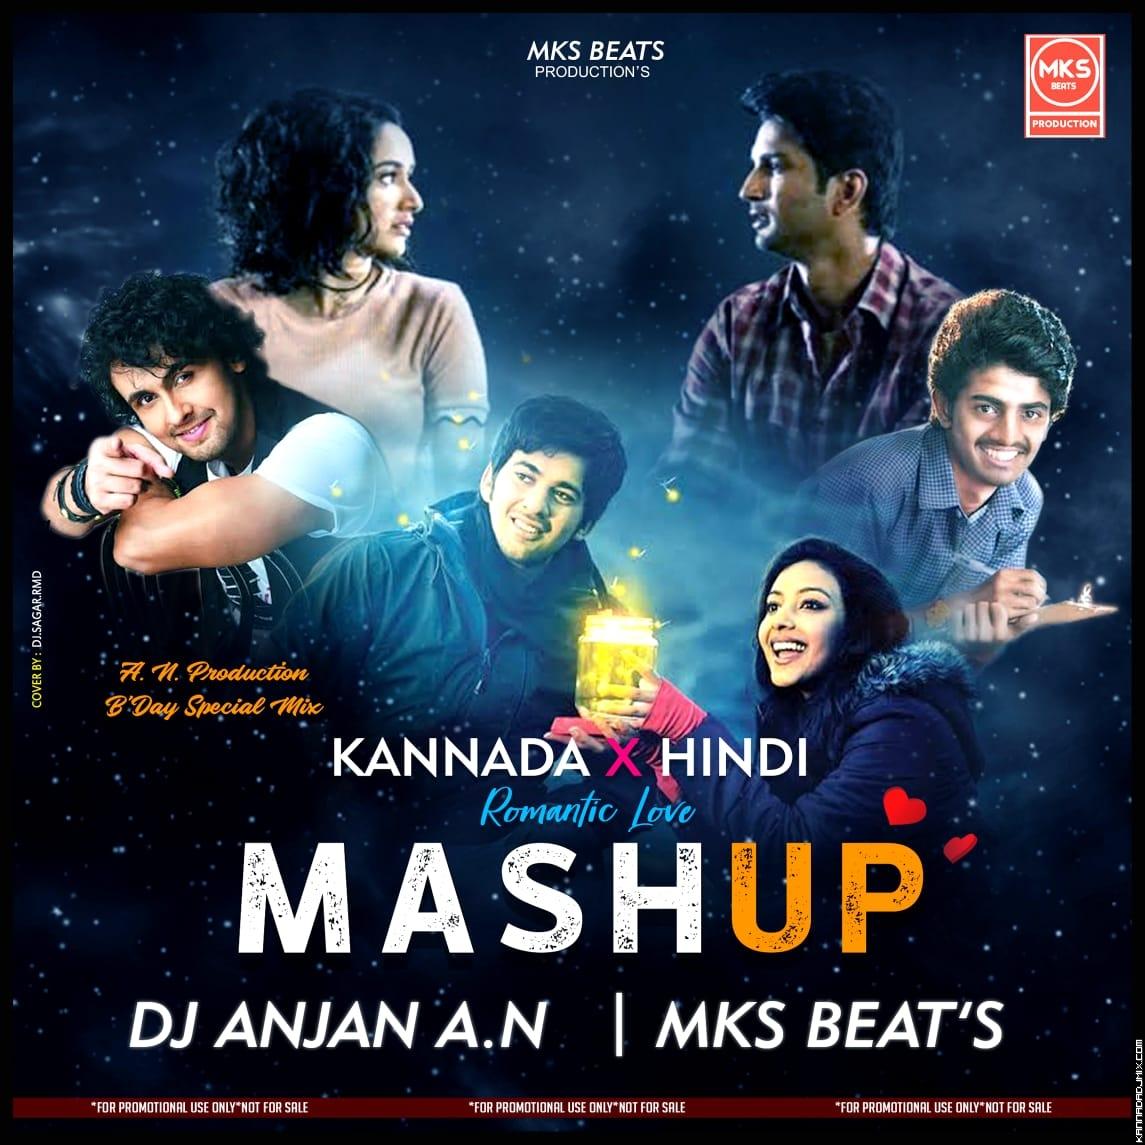 KANNADA x HINDI ROMANTIC LOVE MUSHUP -Mks Beats Production x  AN  Production .mp3